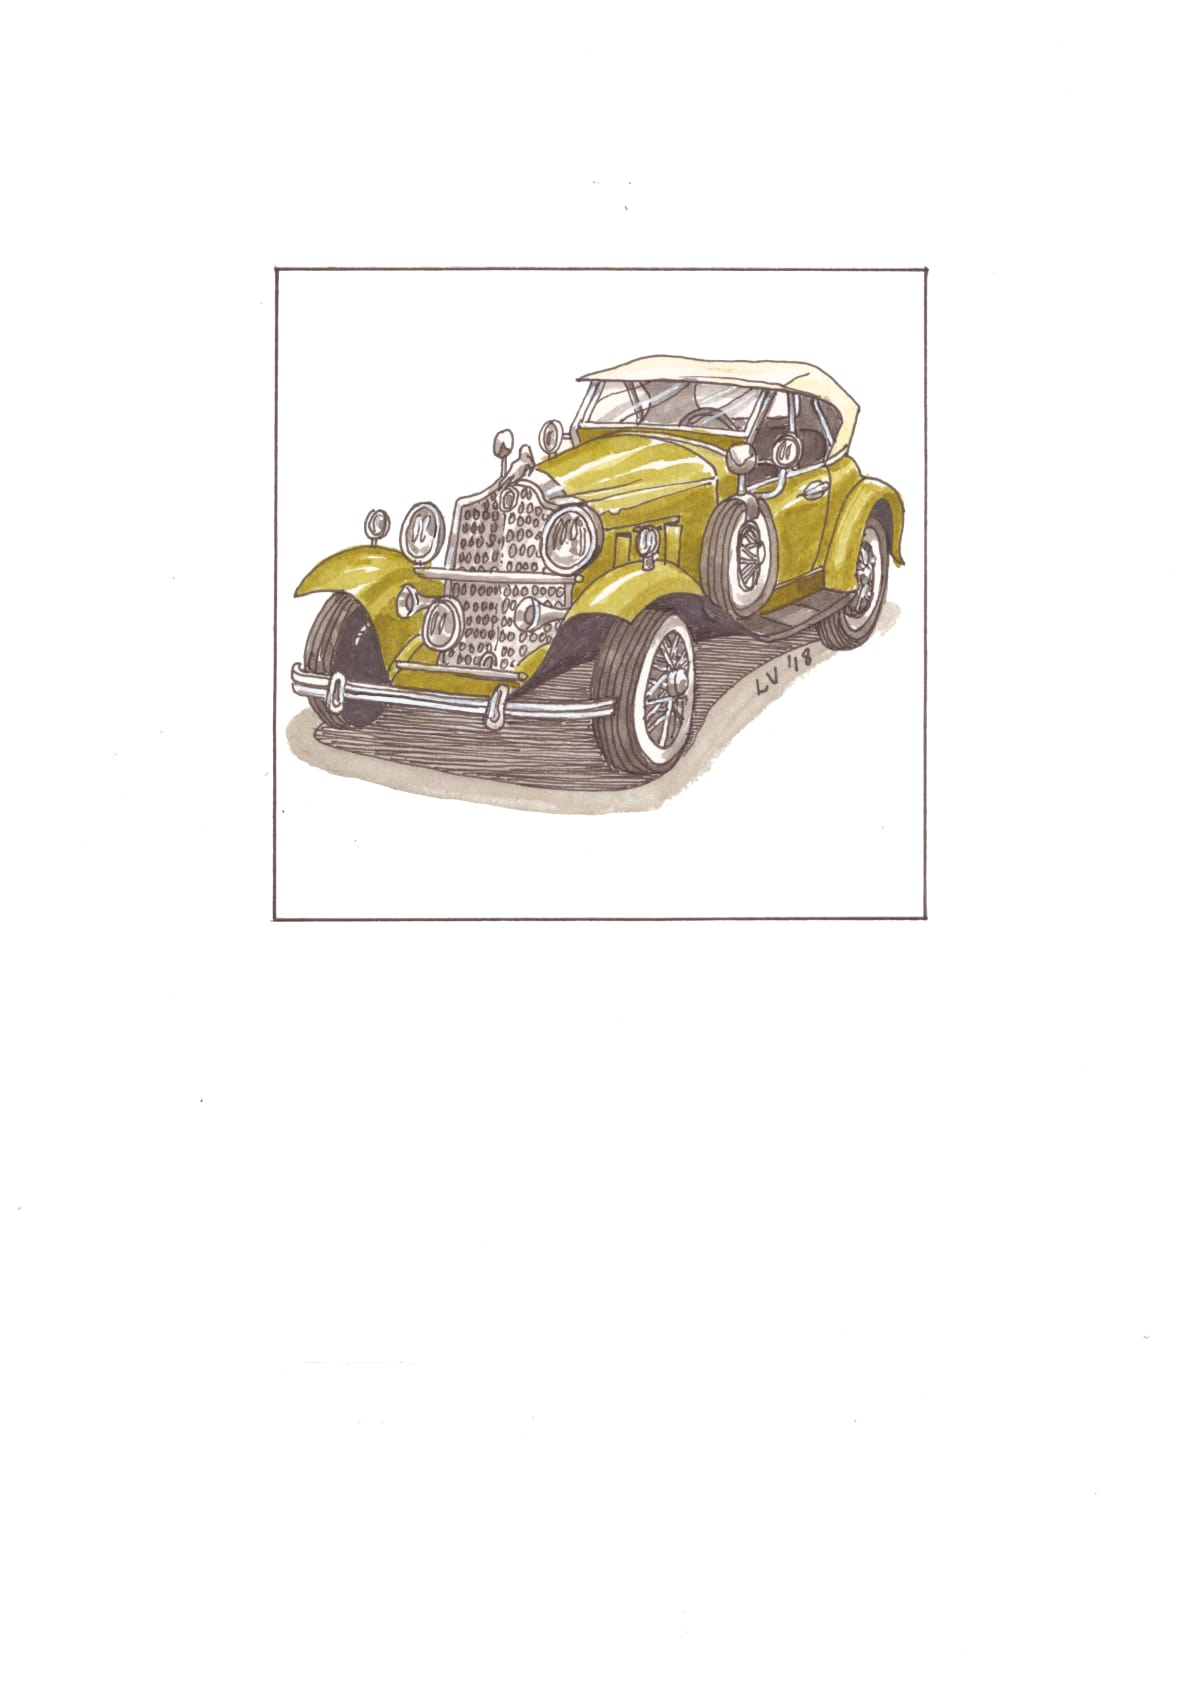 Leonora Venter, 1930's Packard Roadster, 2018